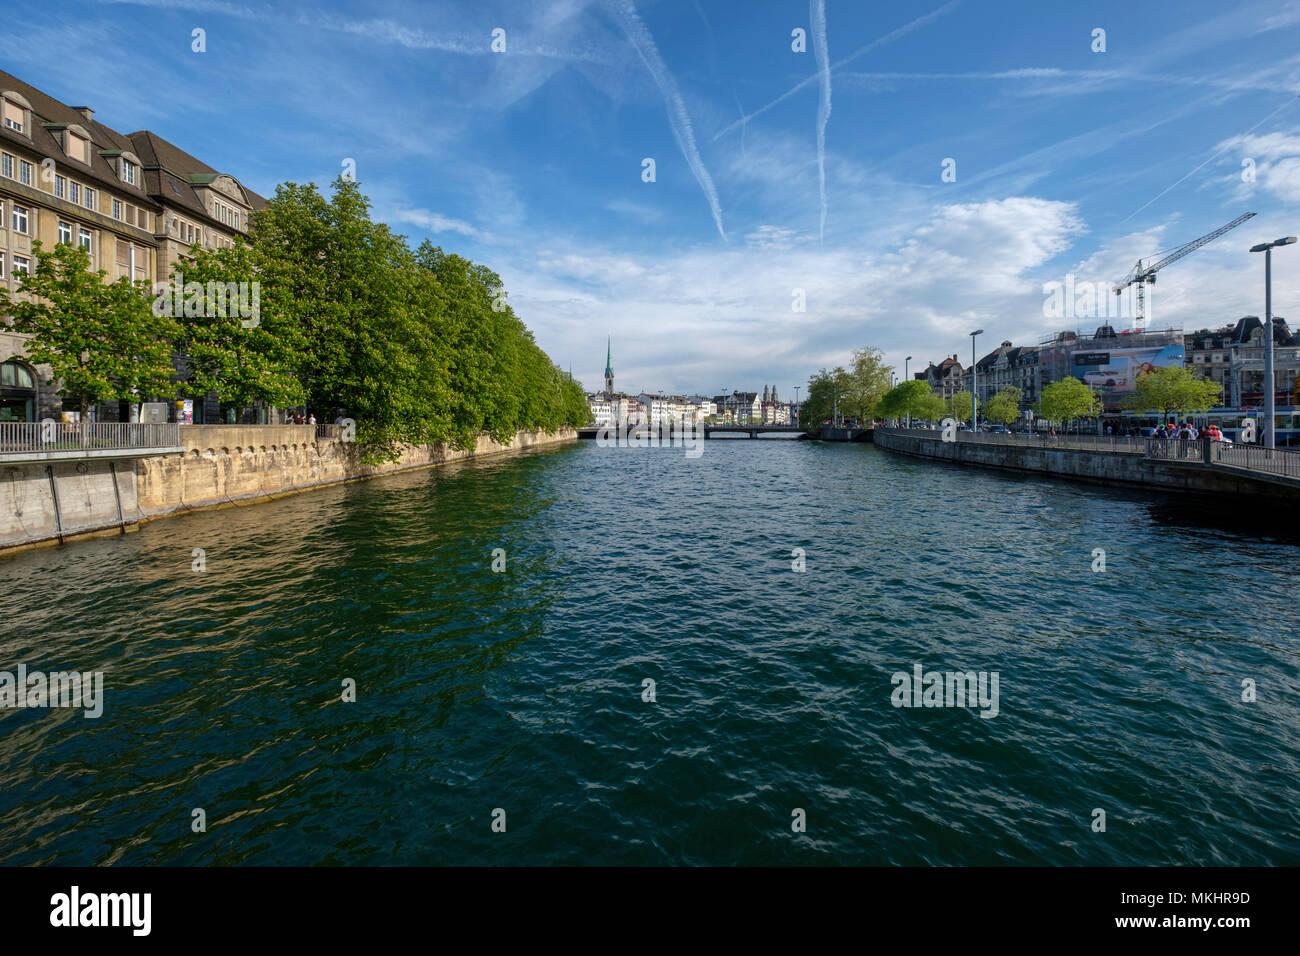 Scenic view of Zurich and the Bahnhofbrücke bridge over the Limmat river, Zurich, Switzerland, Europe - Stock Image